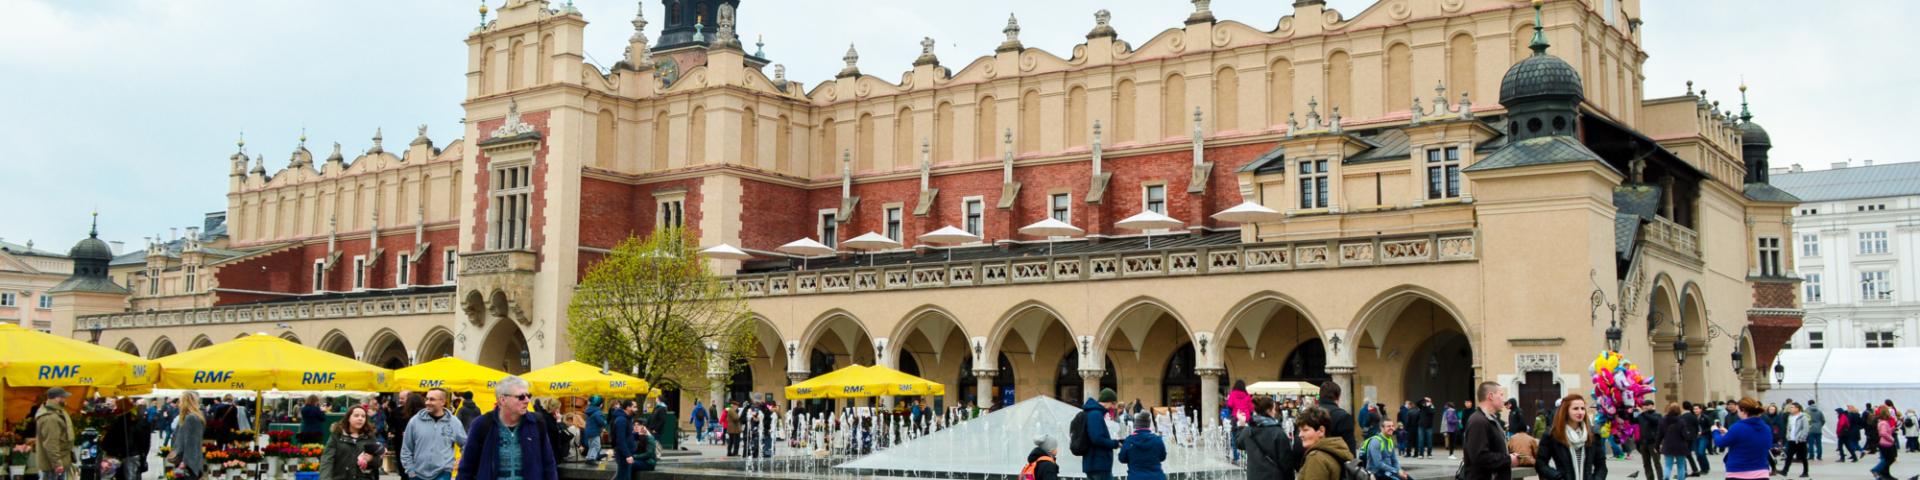 Cloth Hall, Main Square, Krakow